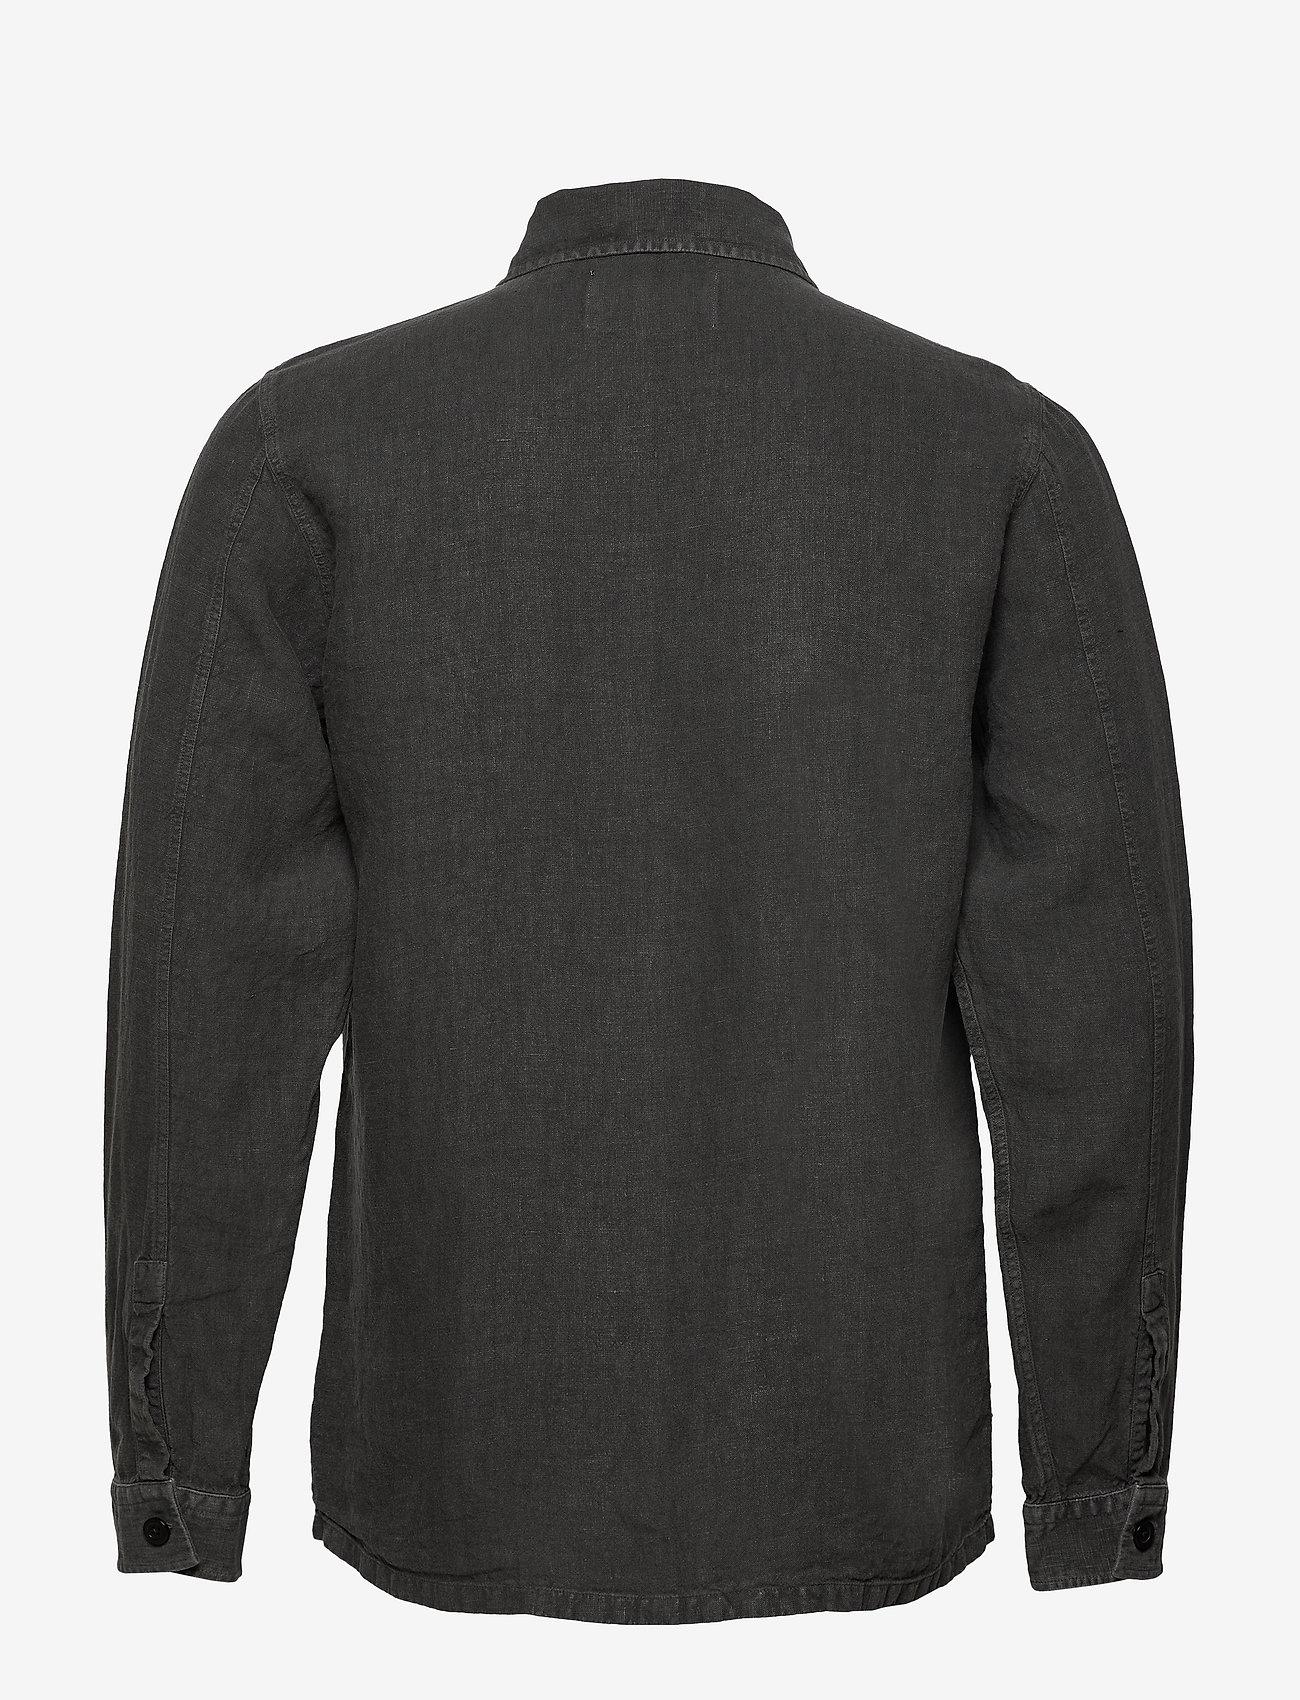 NN07 - Berner 1235 - yläosat - dark grey - 1